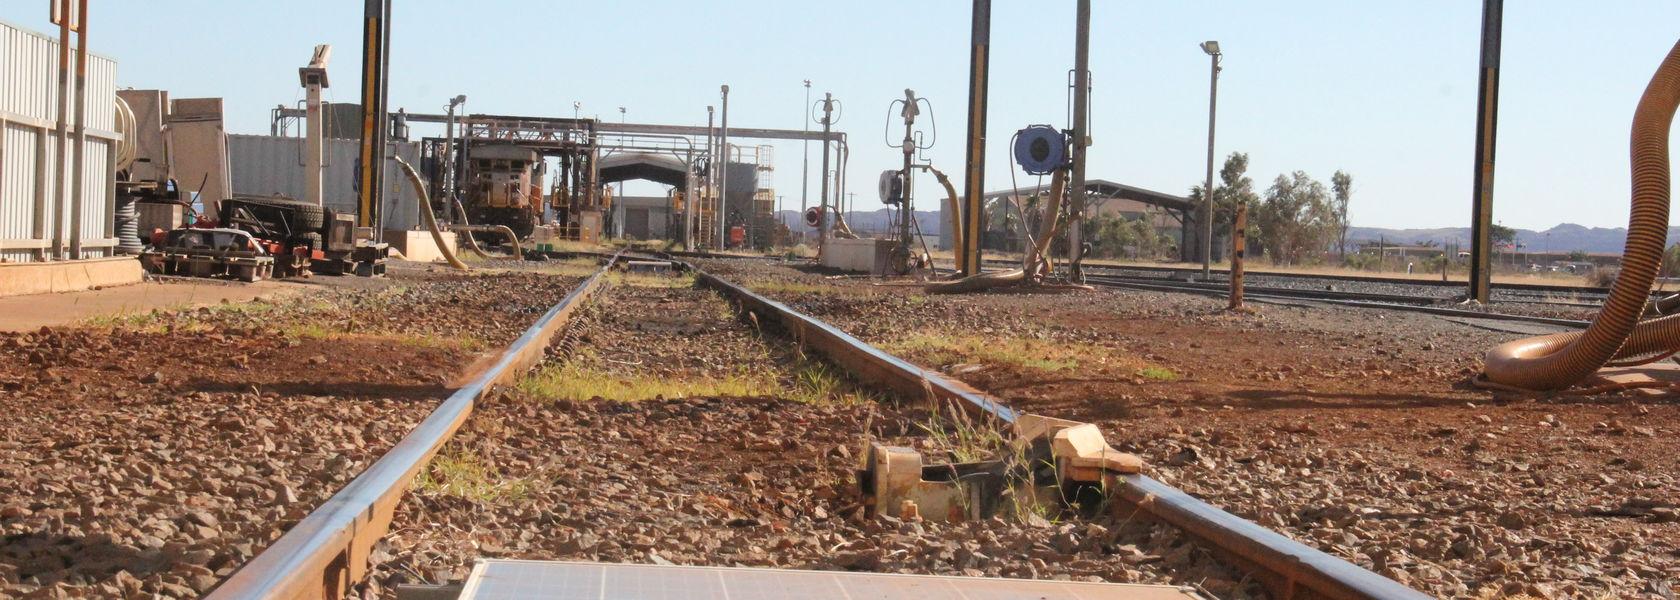 FIFO benefits regions outside Pilbara, Rio Tinto says